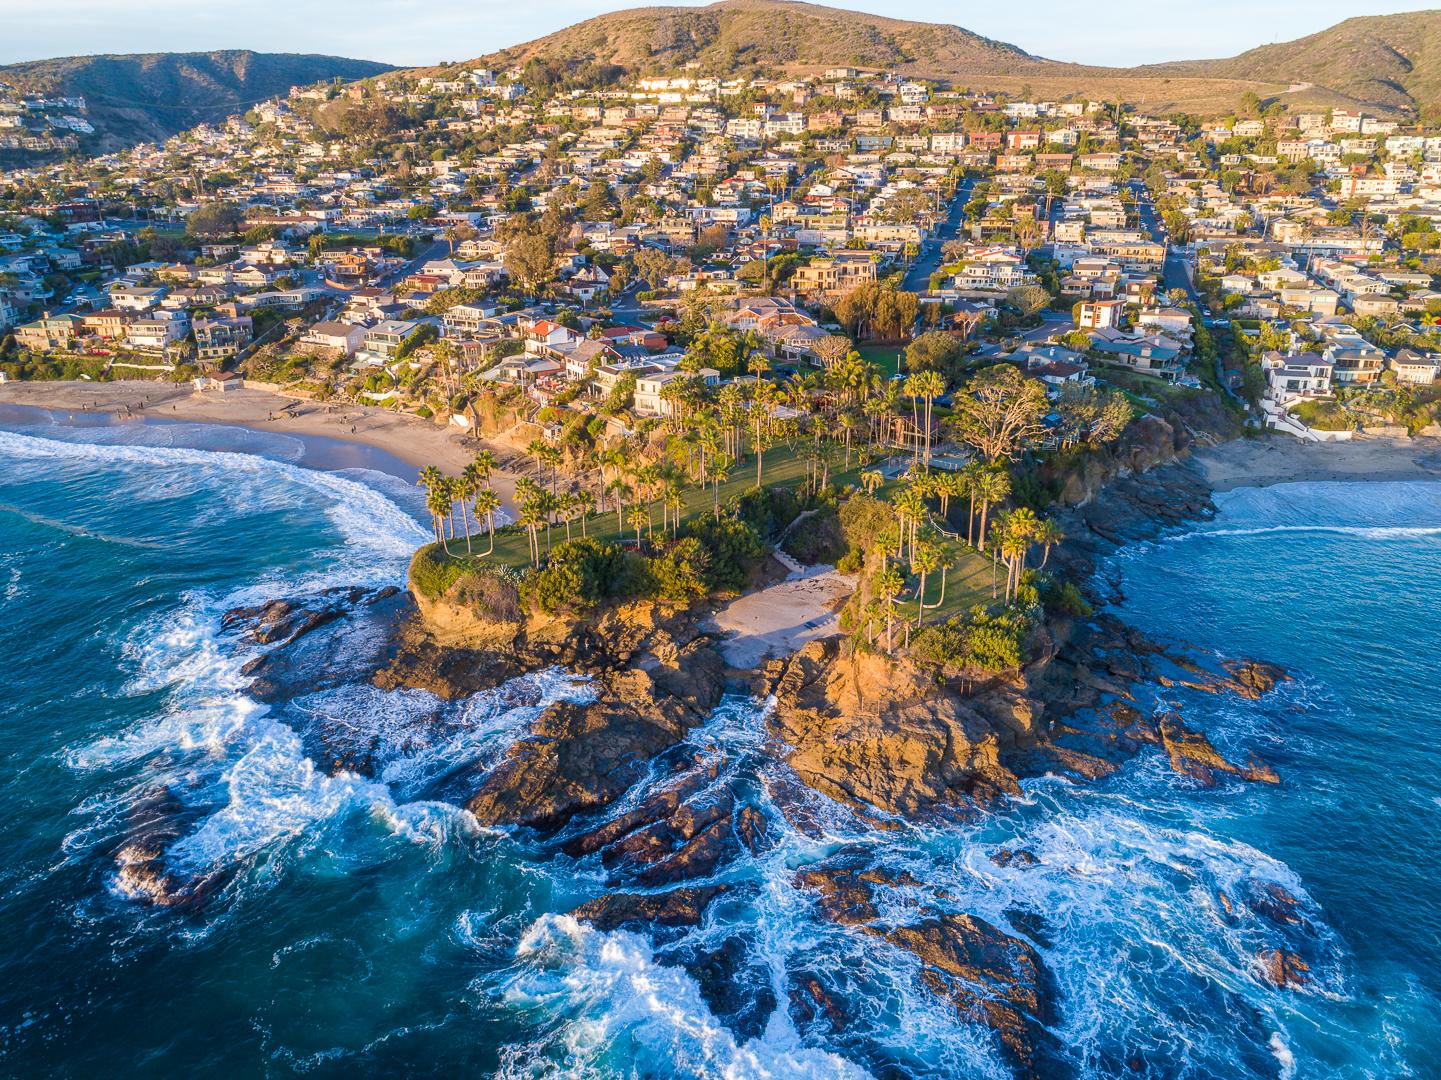 laguna beach drone photography california.jpg